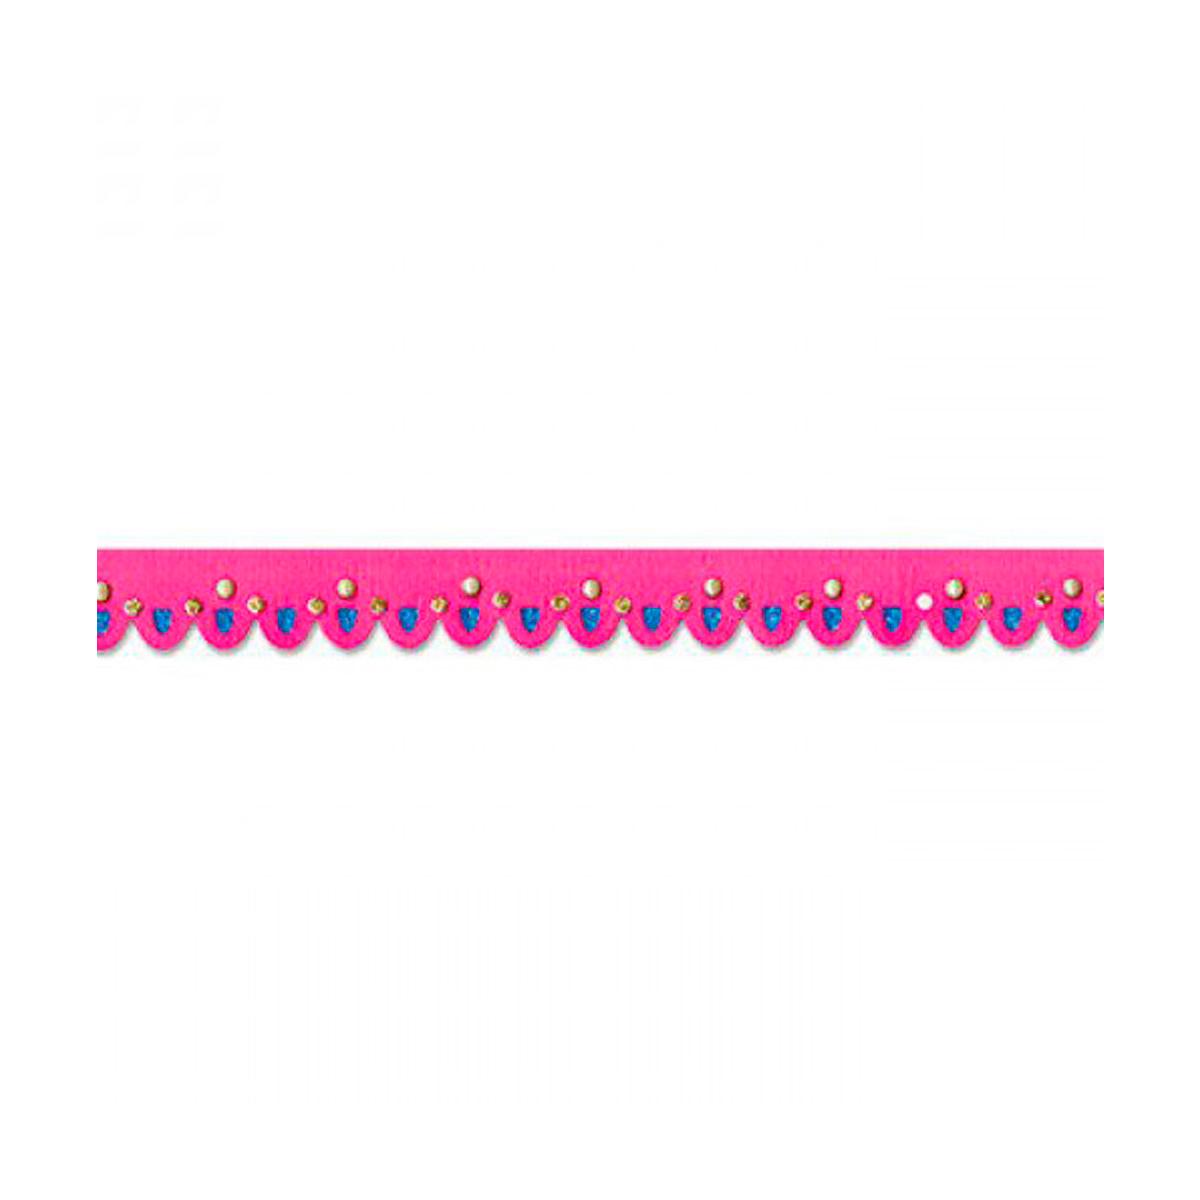 658394 Форма для вырубки Лента Резная Sizzlits Decorative Strip Die